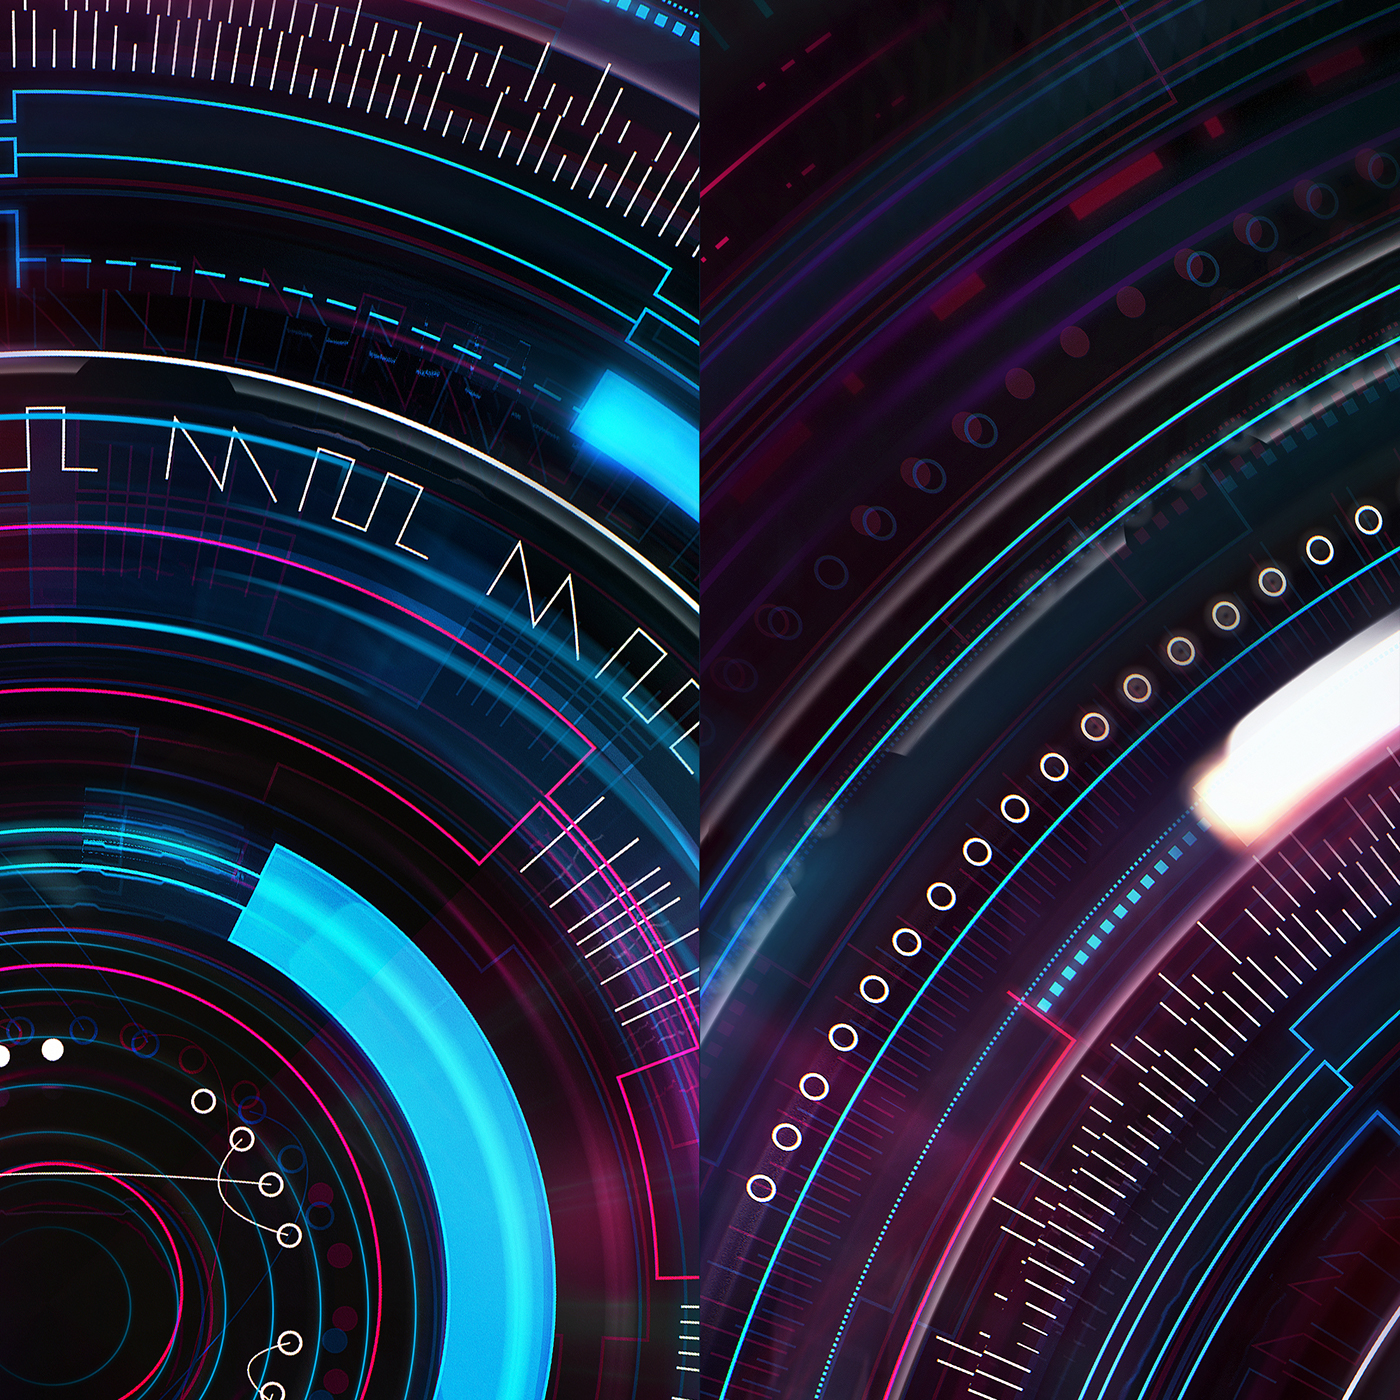 tech radial circular pink blue japan album art Comiket edm SYNTH Aberdeen happy hardcore japanese